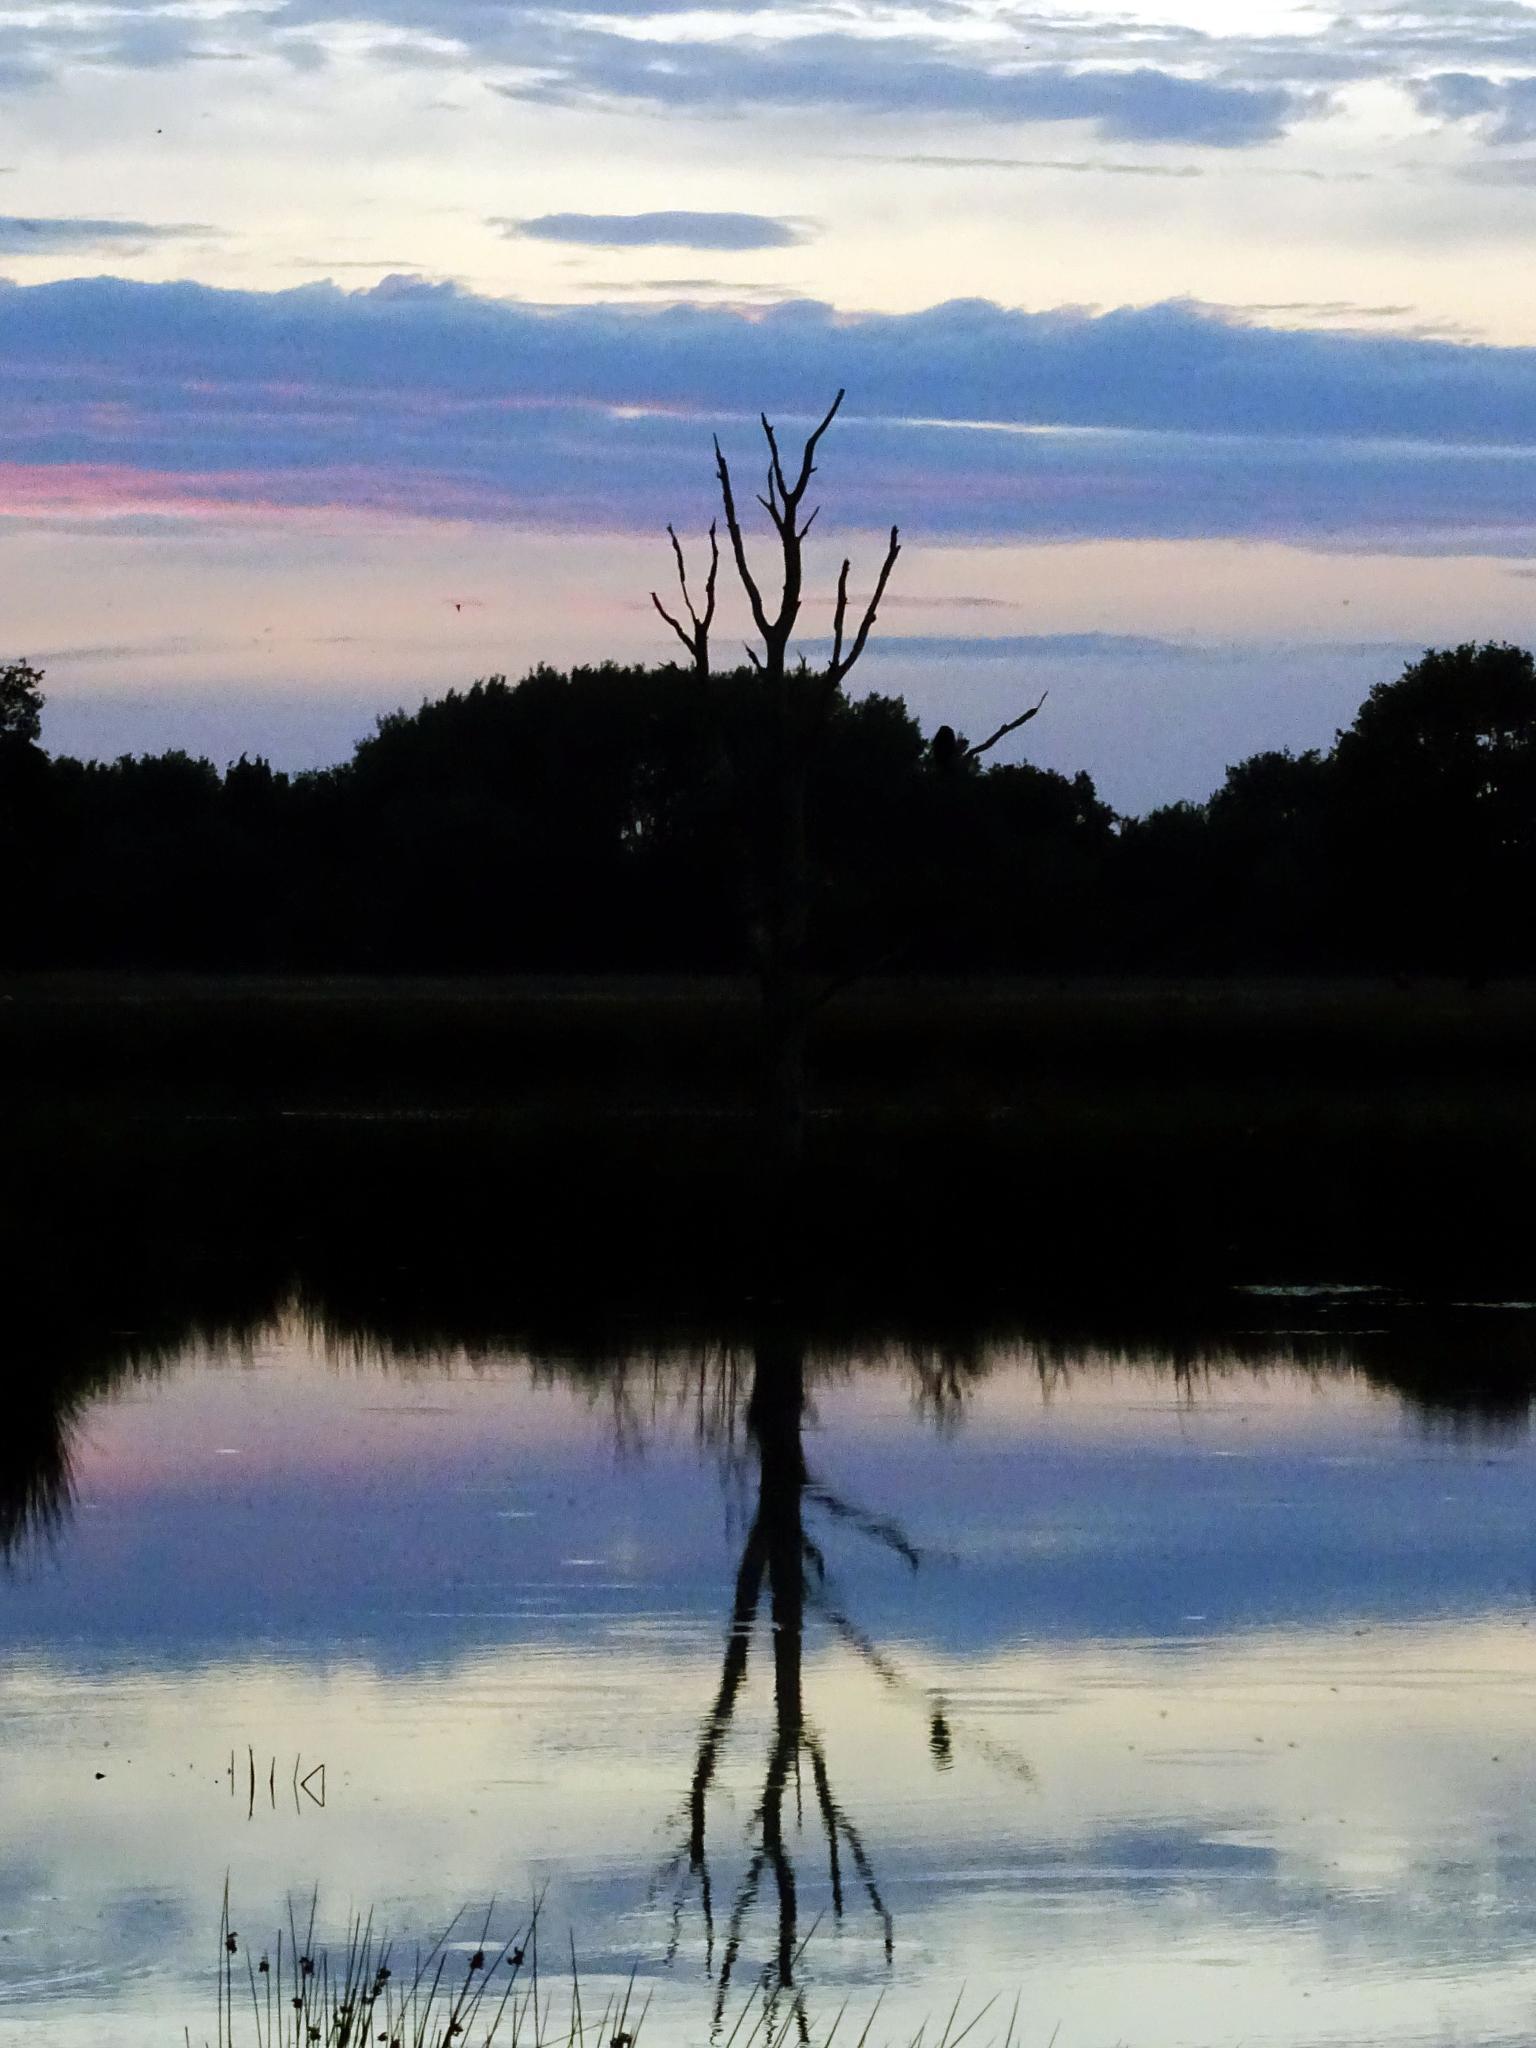 Reflection of a tree by missjoy86